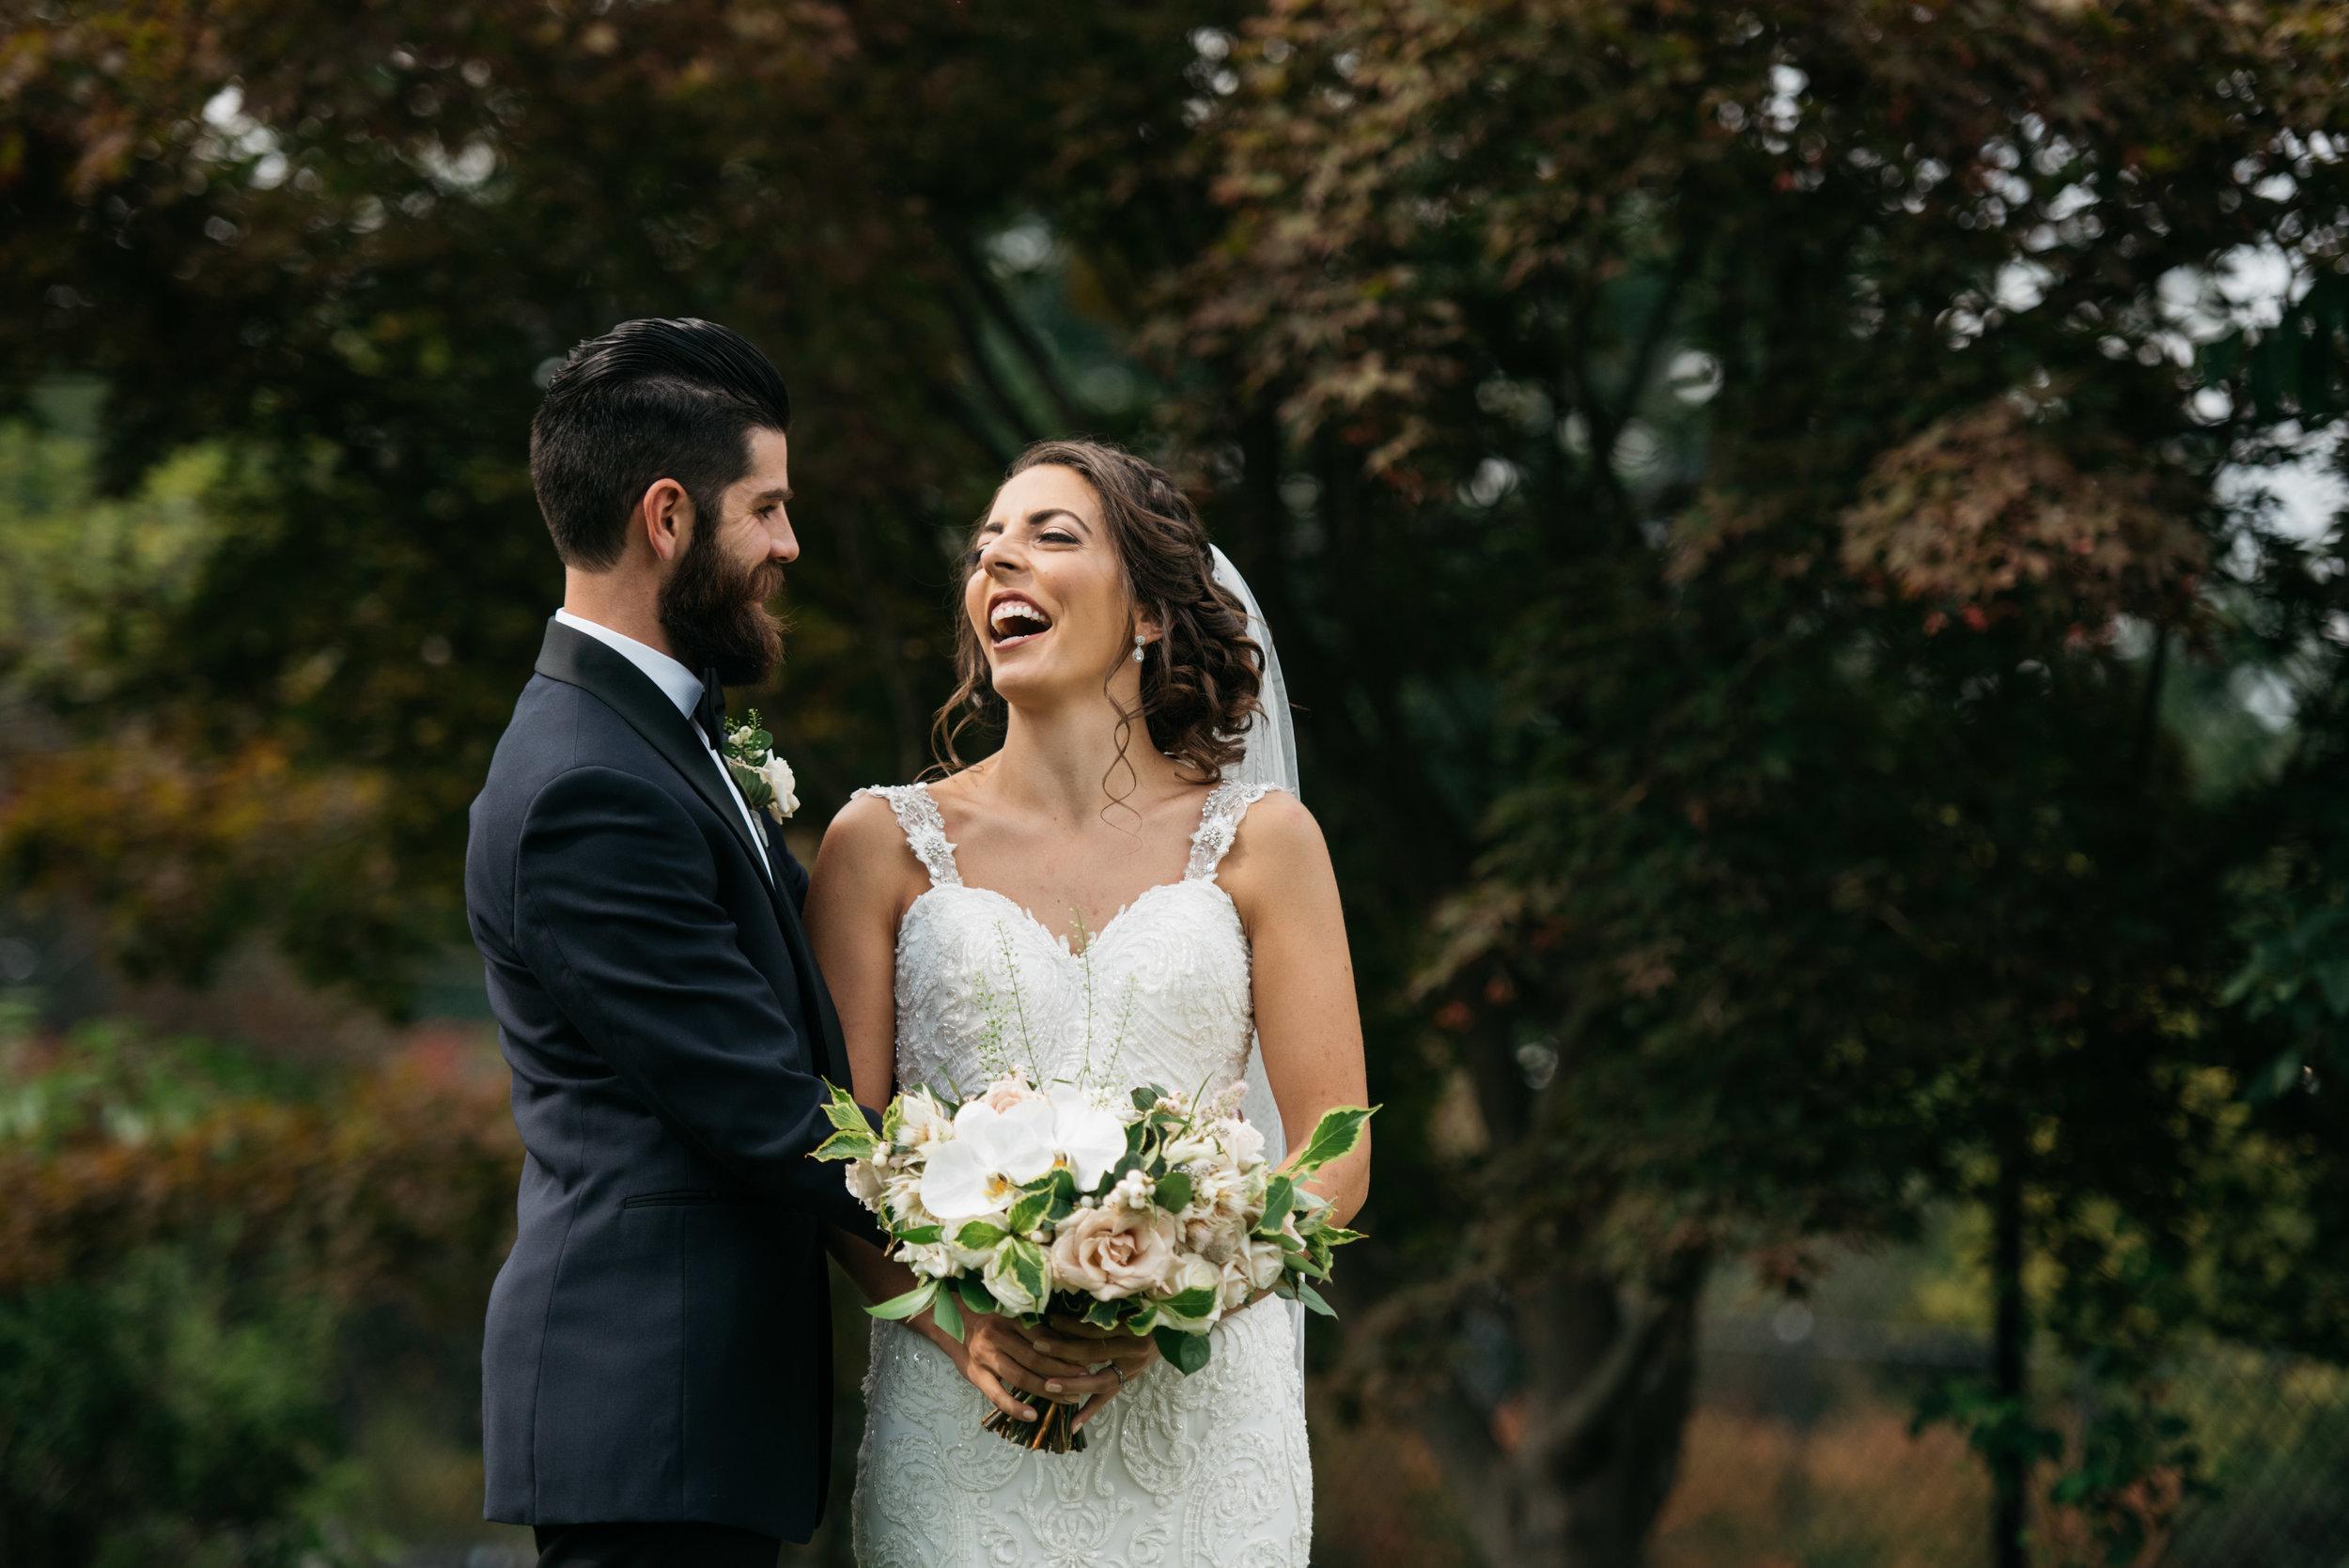 WeddingPhotos | NJPhotographer | Highlights-11-9.jpg